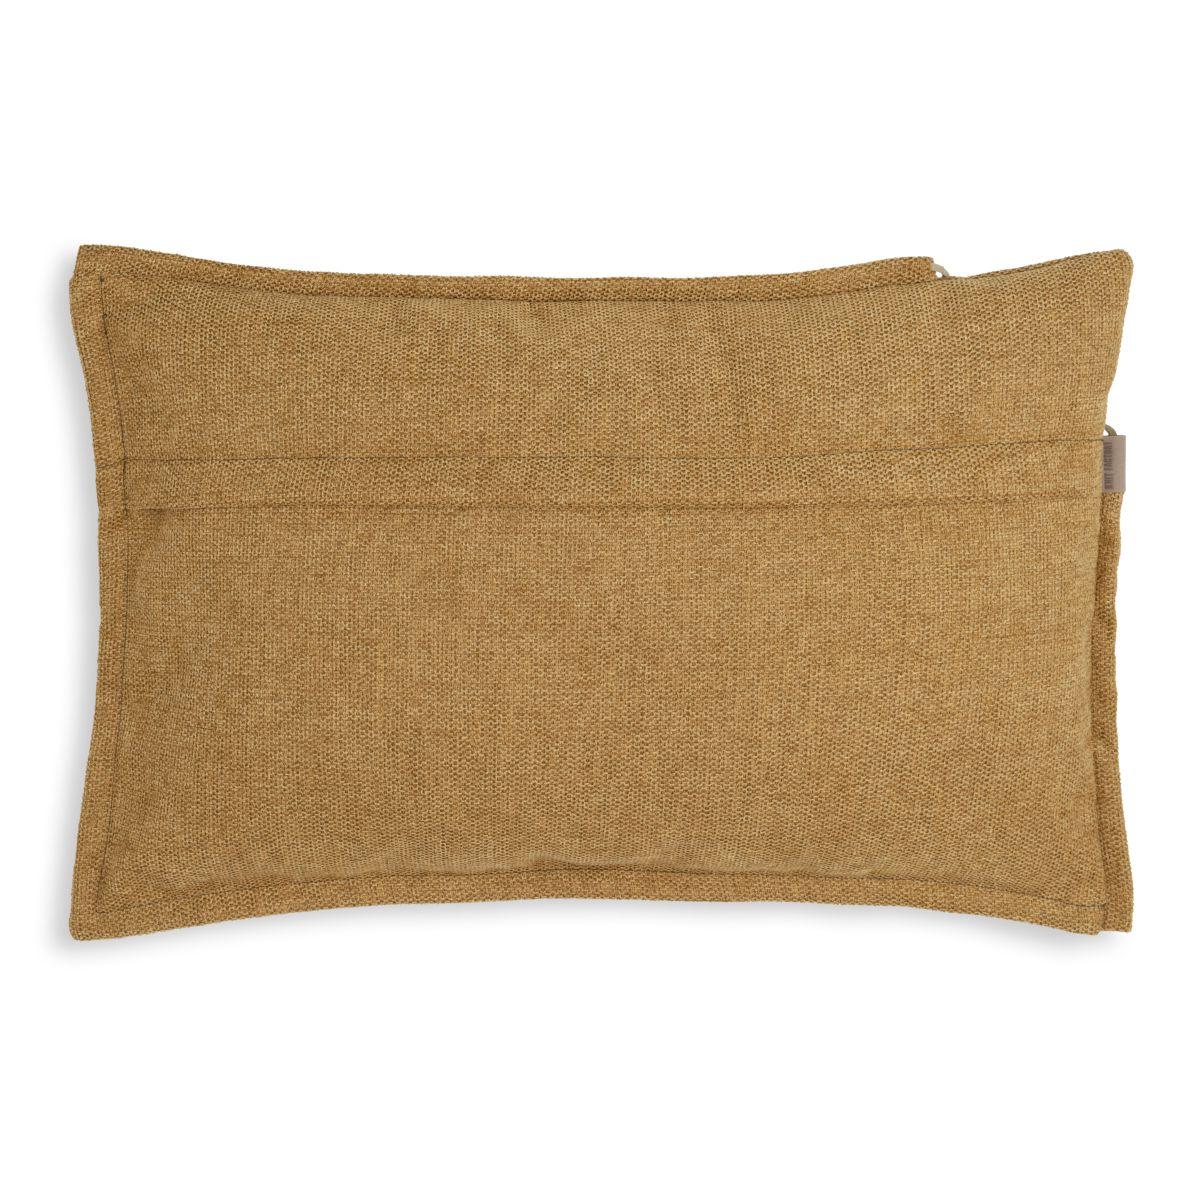 knit factory kf153013017 imre kussen oker 60x40 2